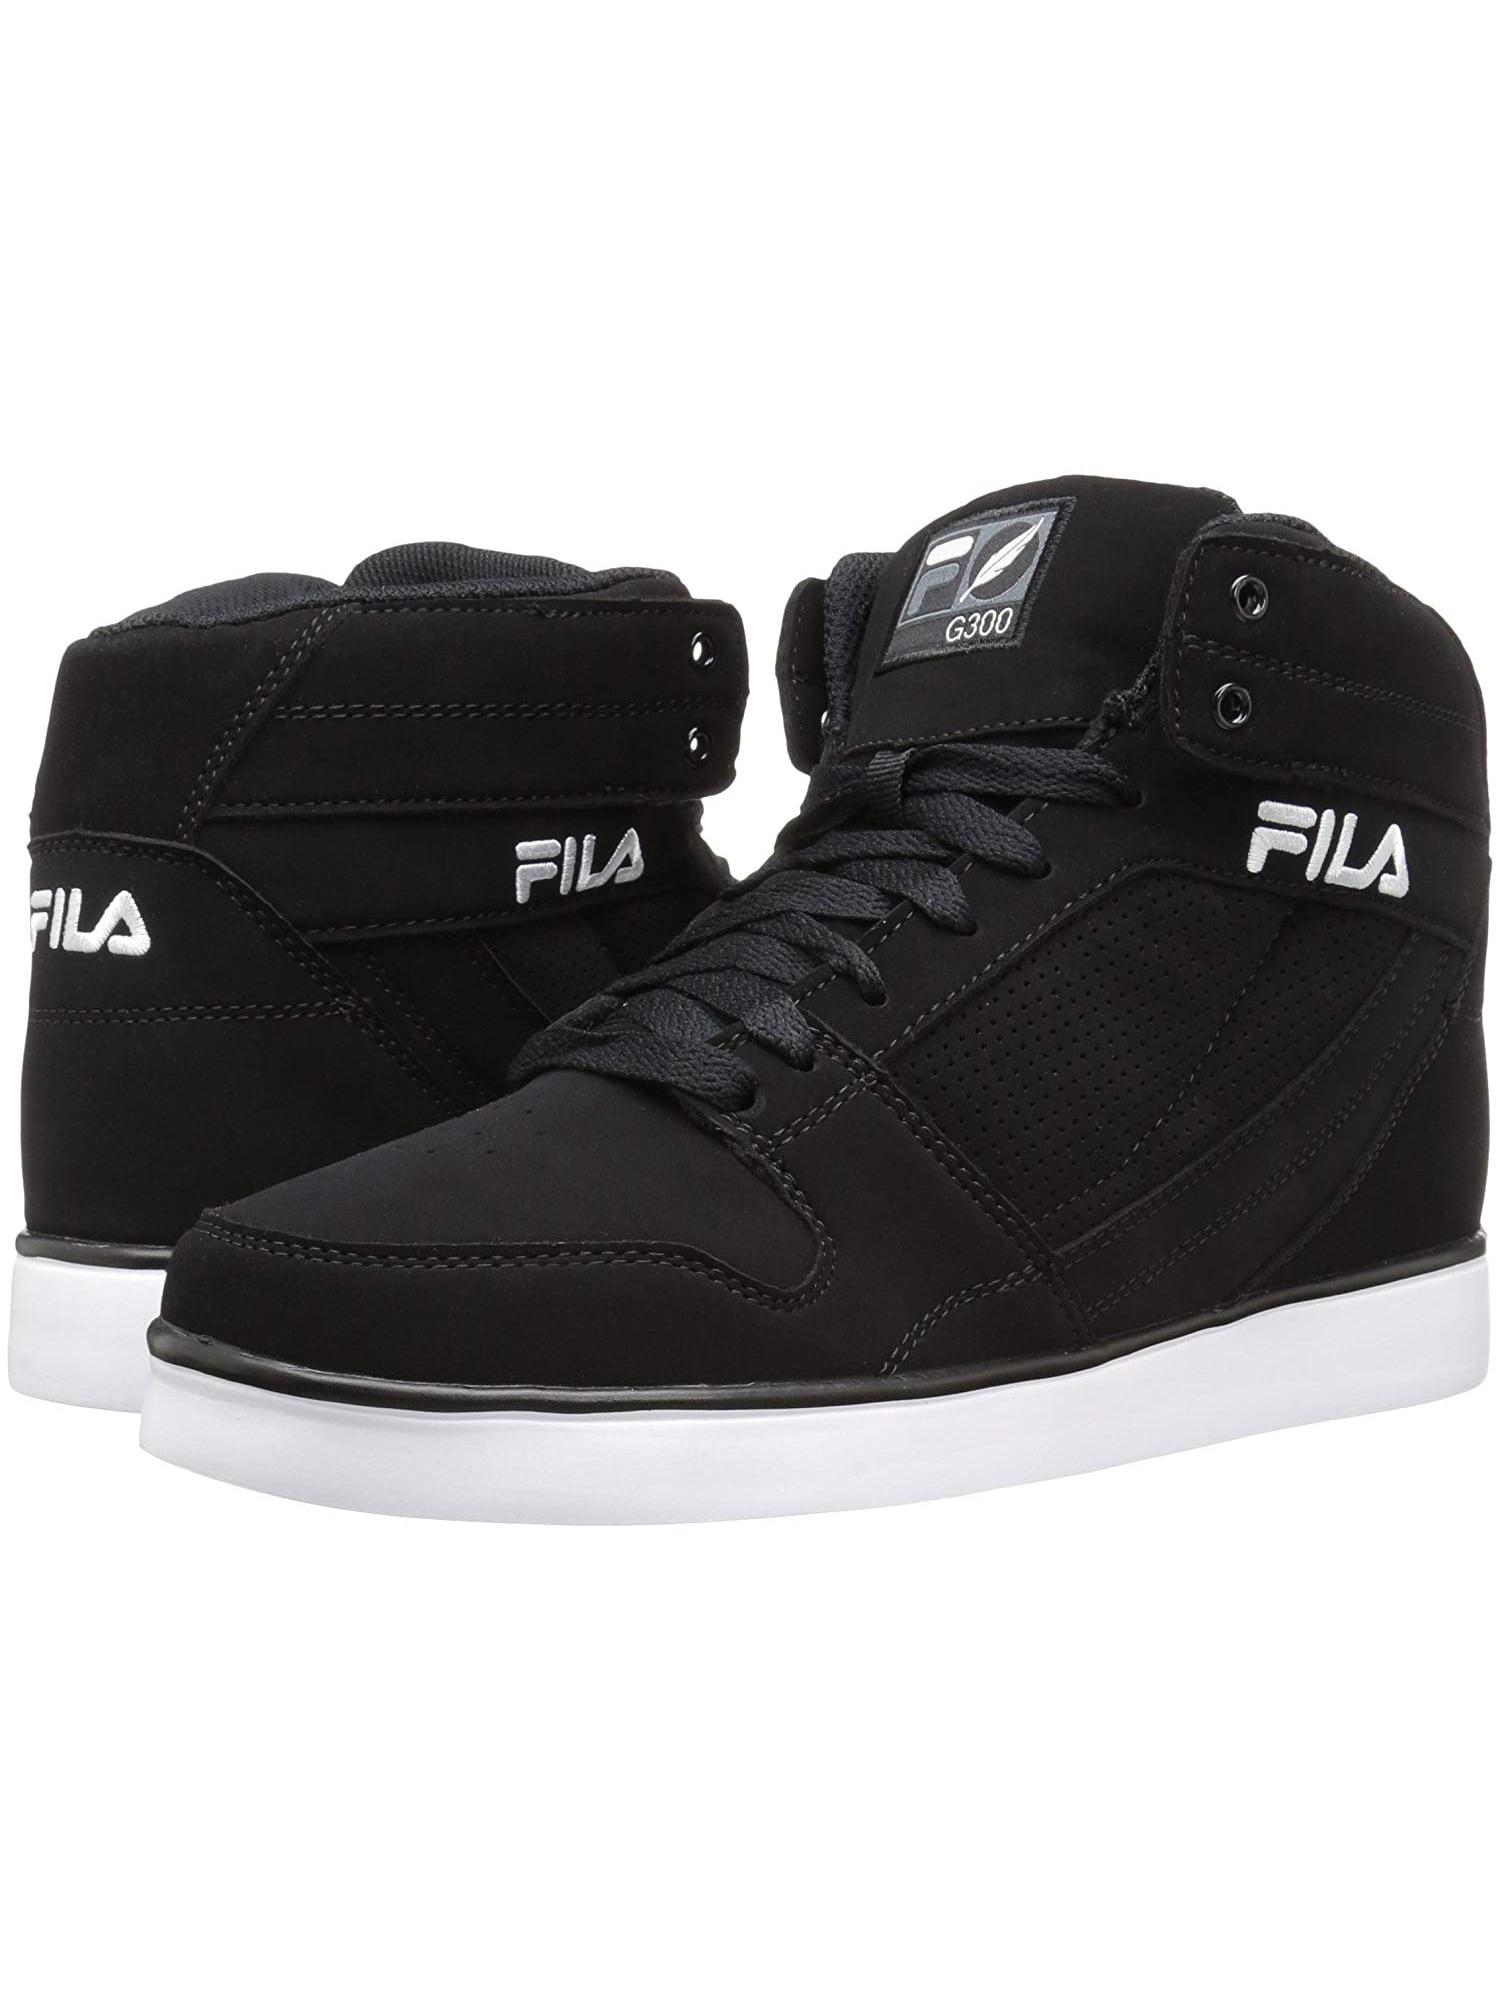 Fila Fila Mens G300 Figueroa Classic Hi Top Leather